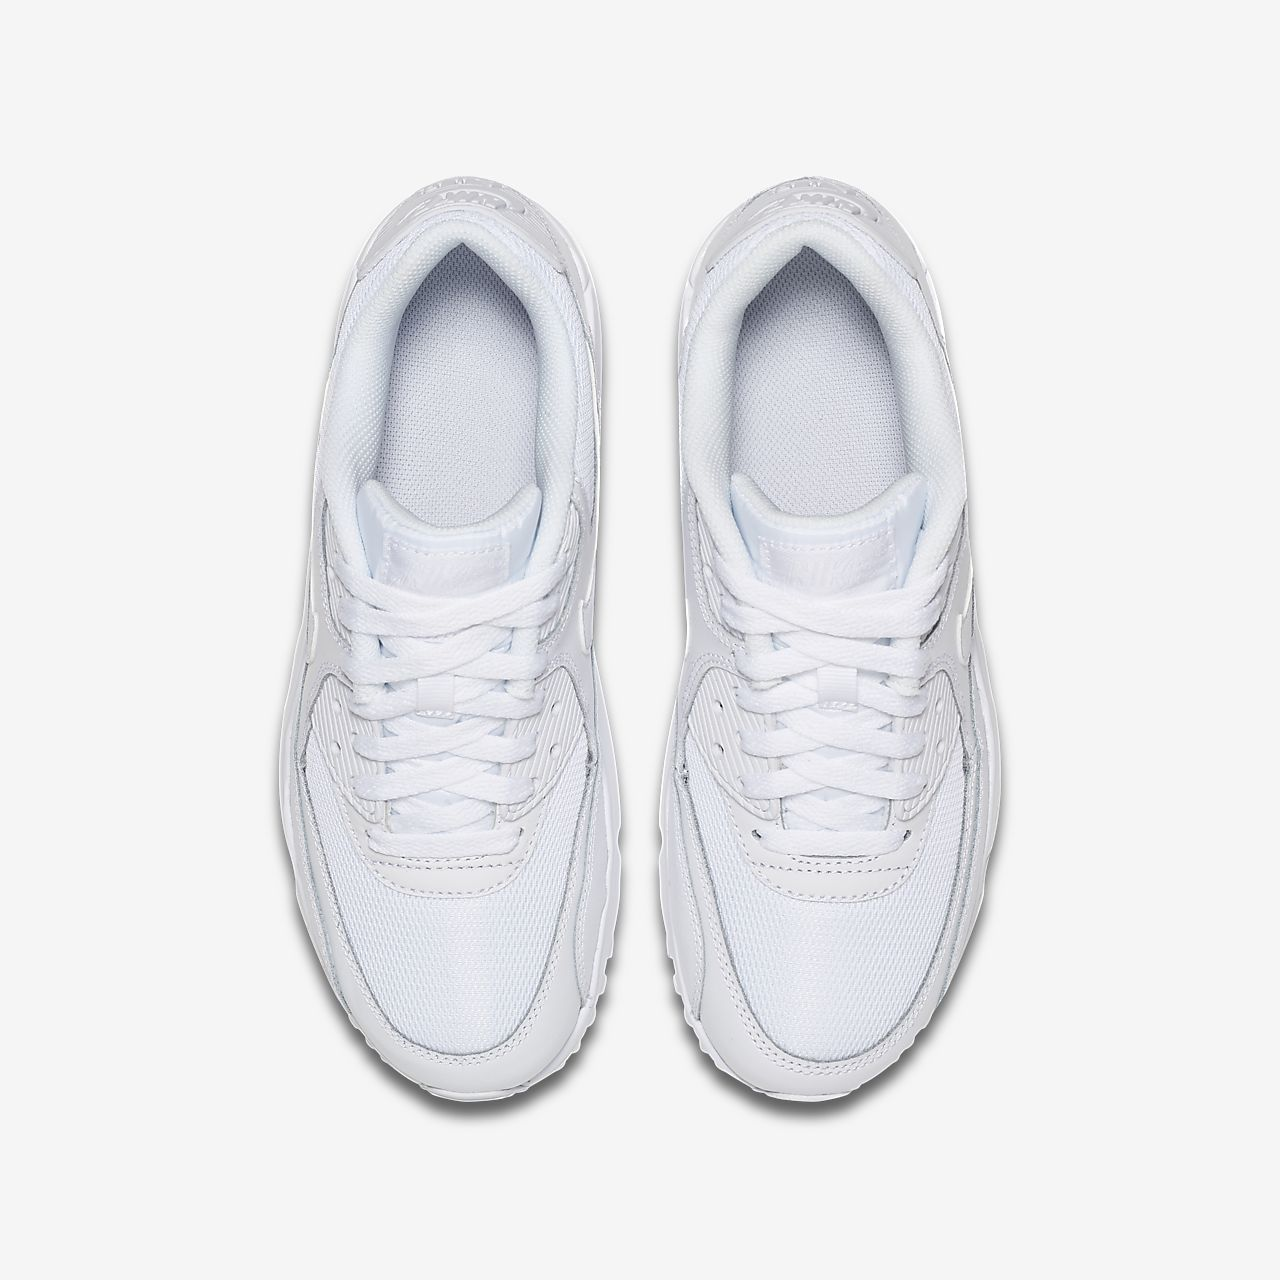 a904af5a8 Nike Air Max 90 Mesh Zapatillas - Niño a. Nike.com ES